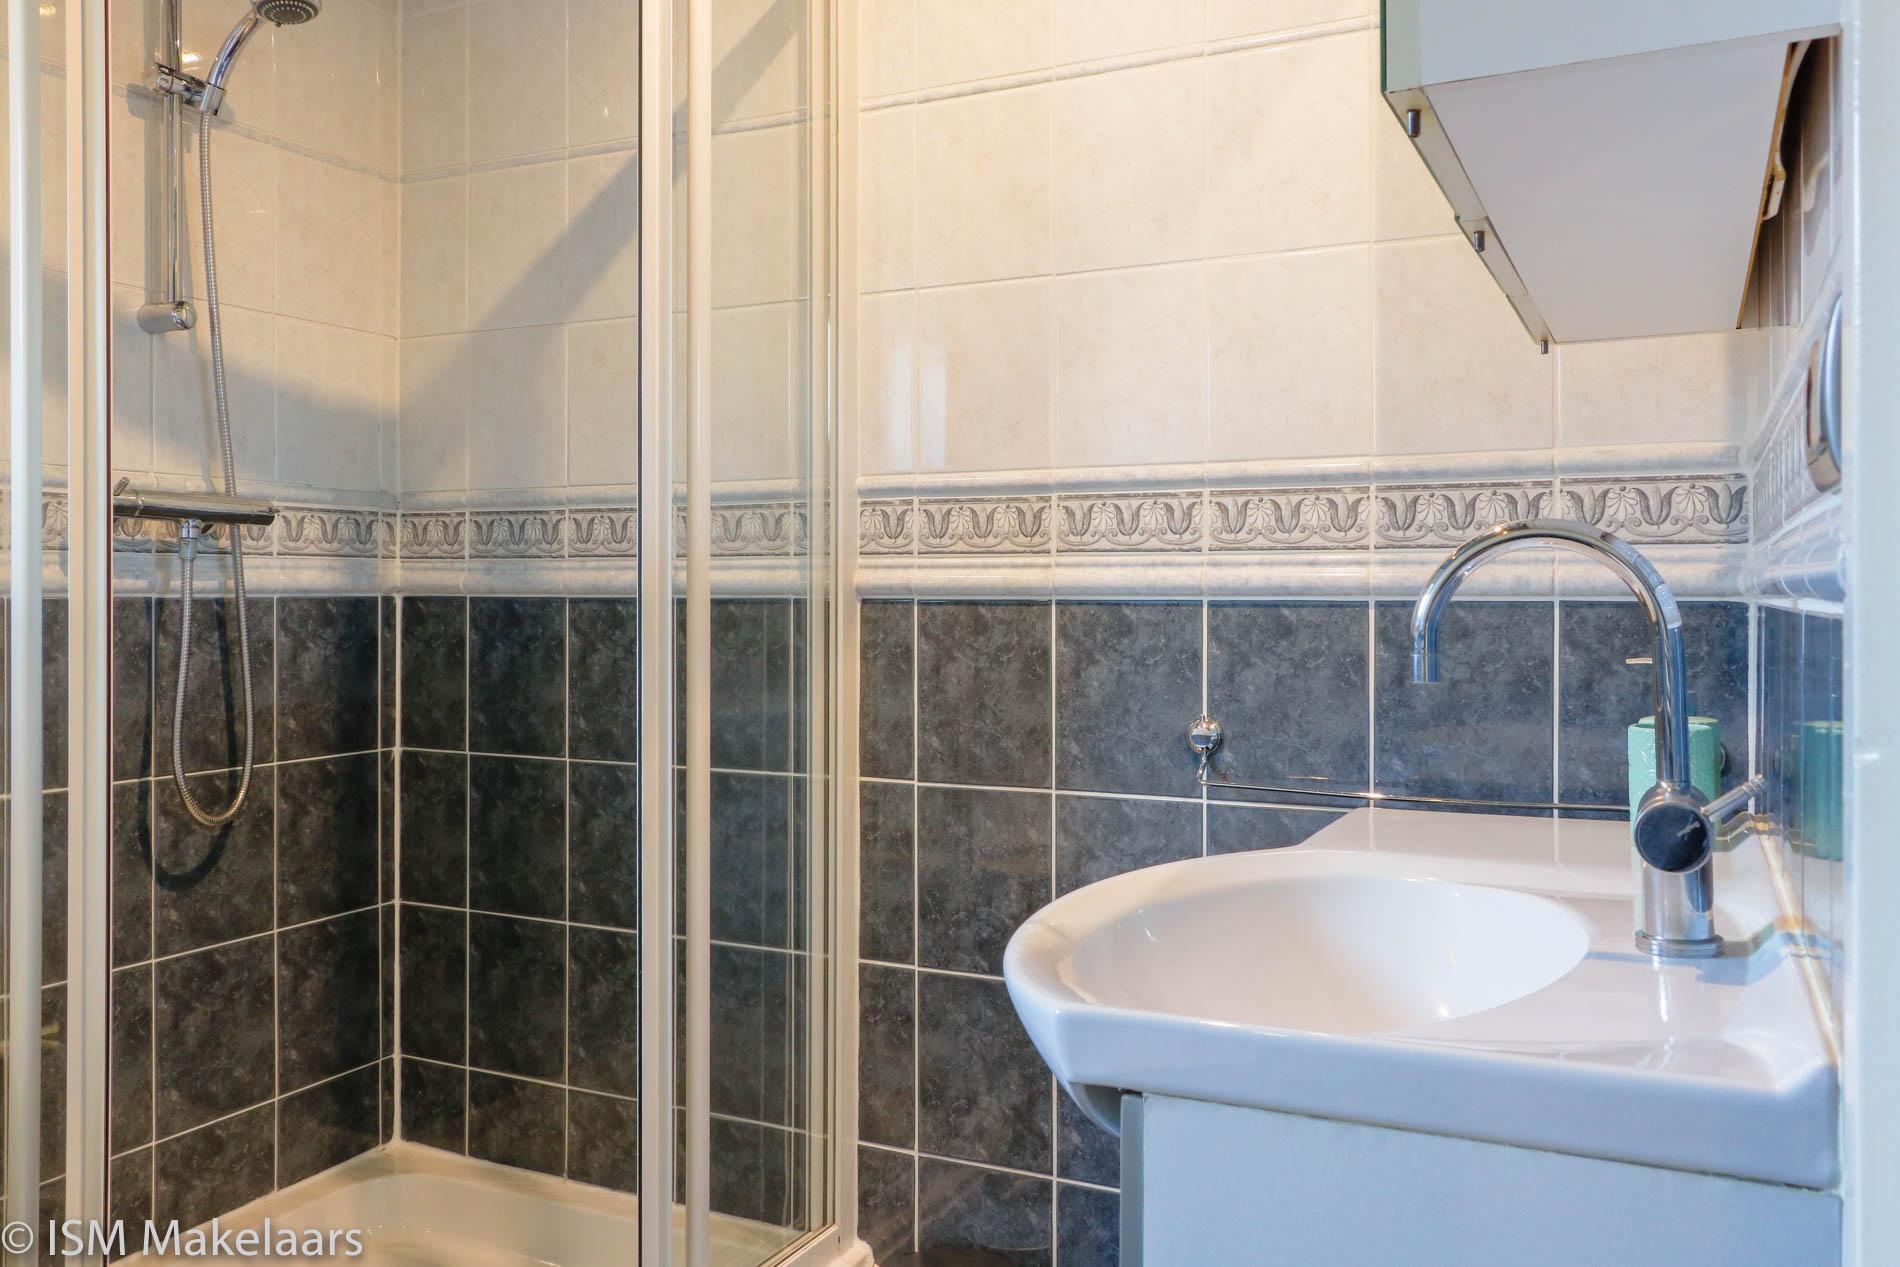 badkamer dijkwelseweg 26 kapelle ism makelaars